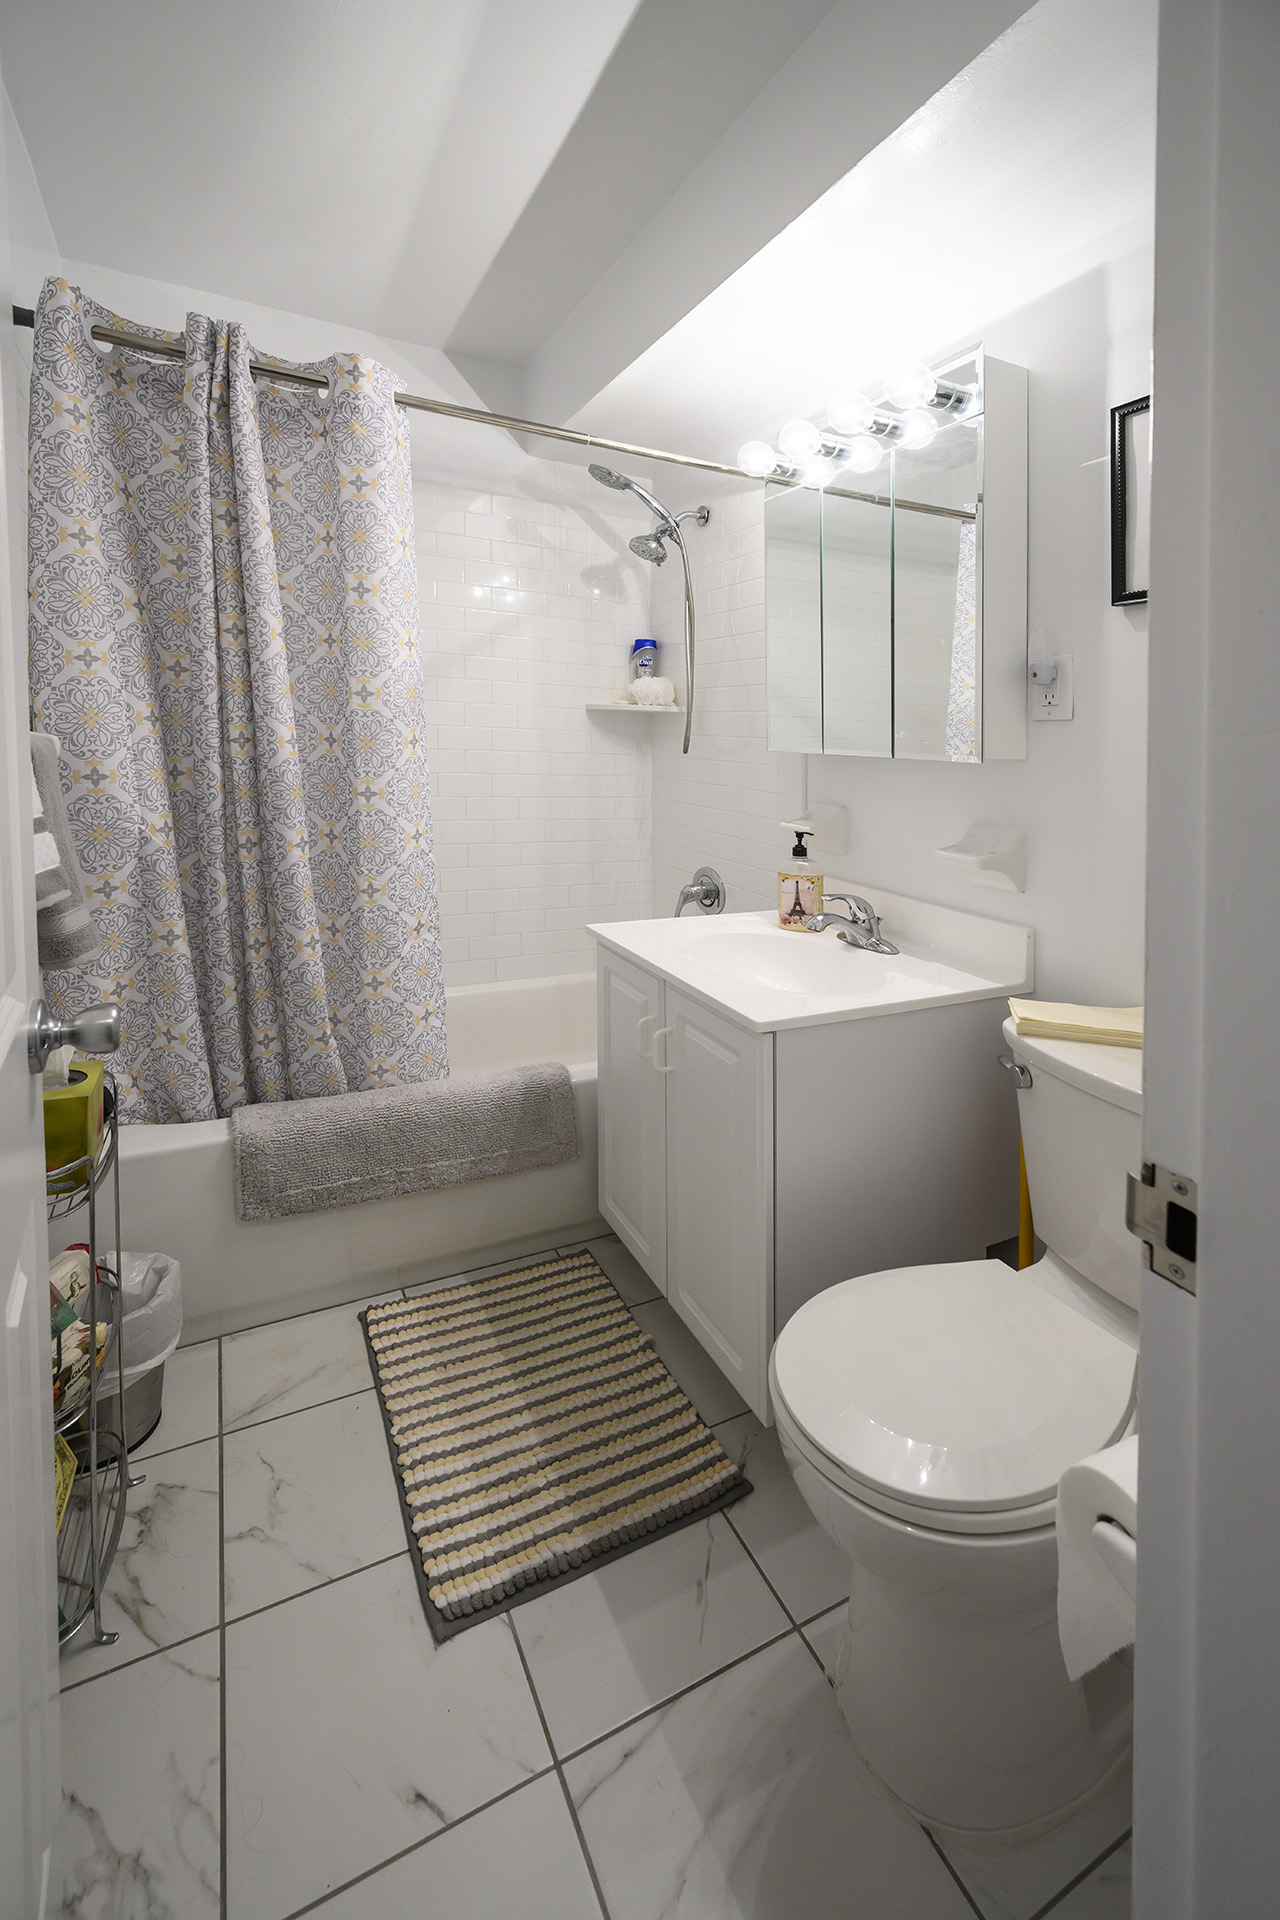 Bathroom interior at Westover House